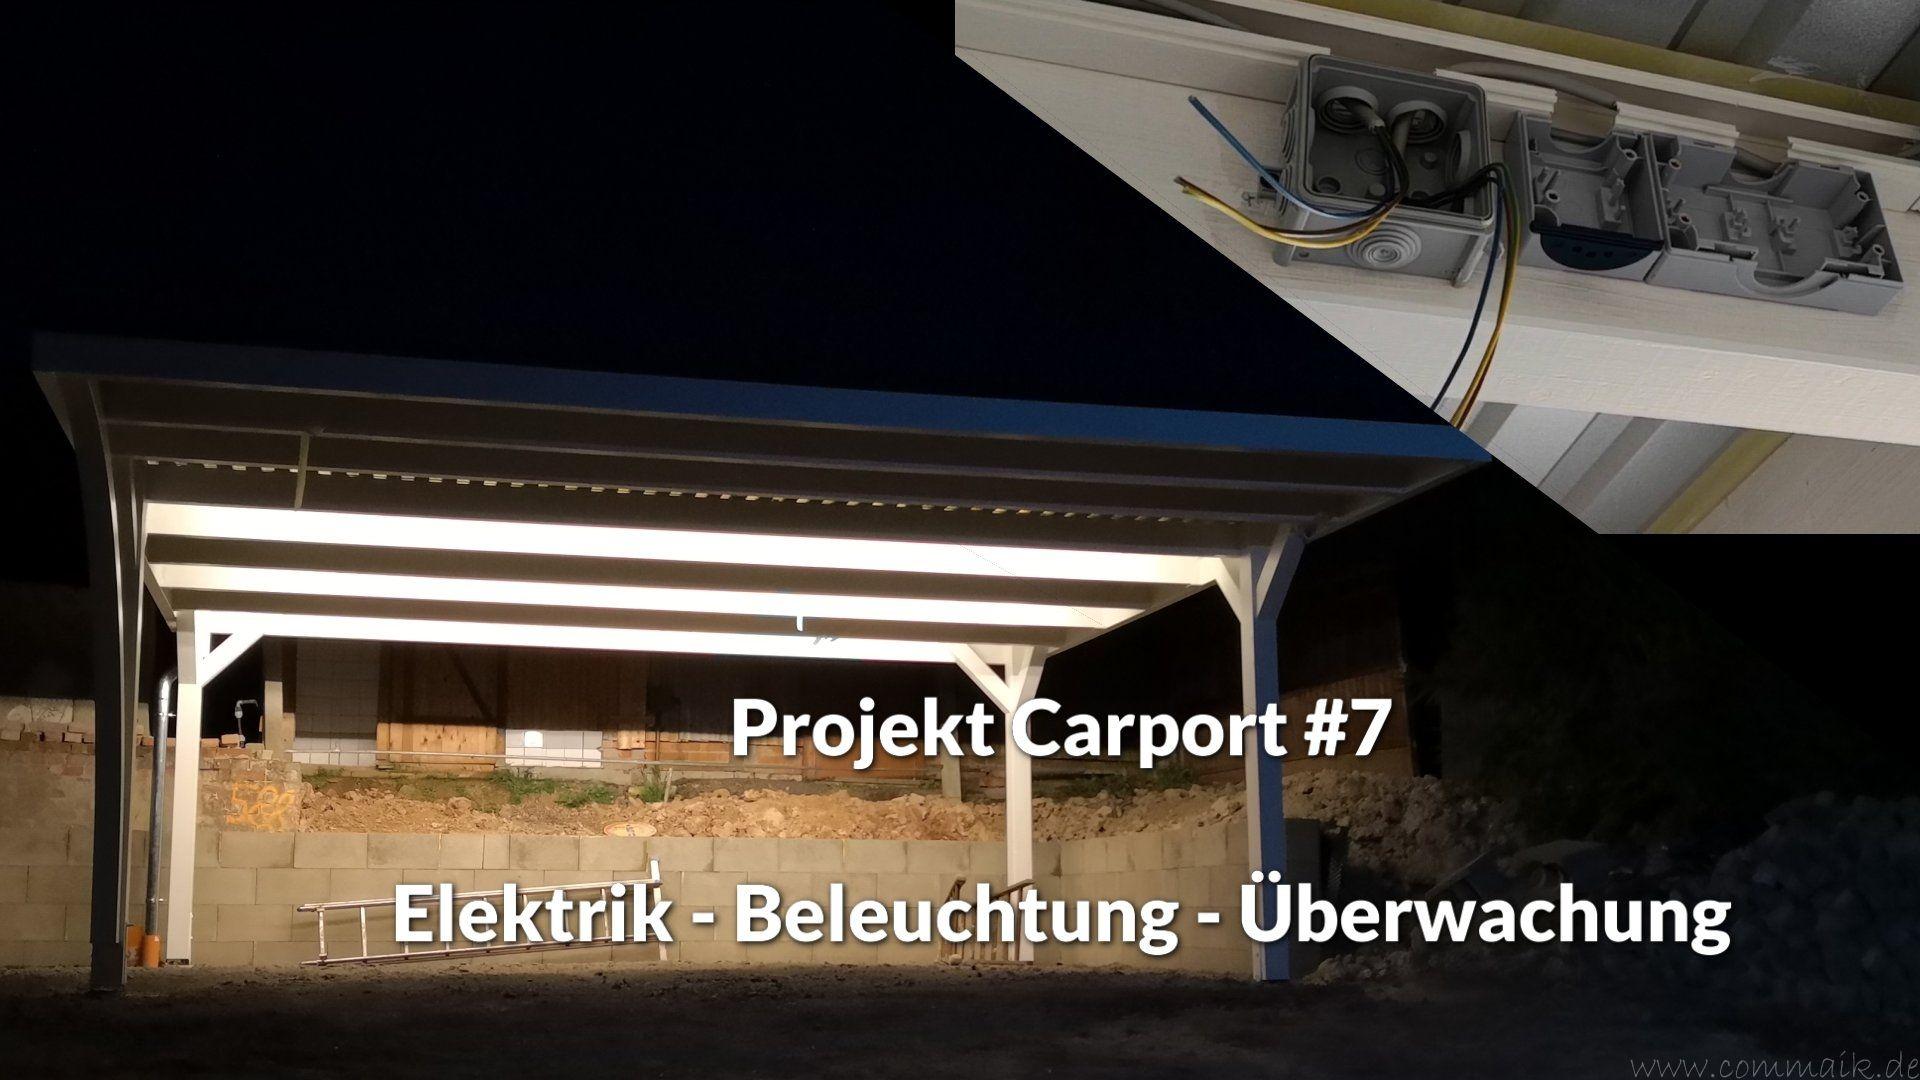 Projekt Carport 7 Elektrik Beleuchtung Uberwachung Carport Beleuchtung Carport Selber Bauen